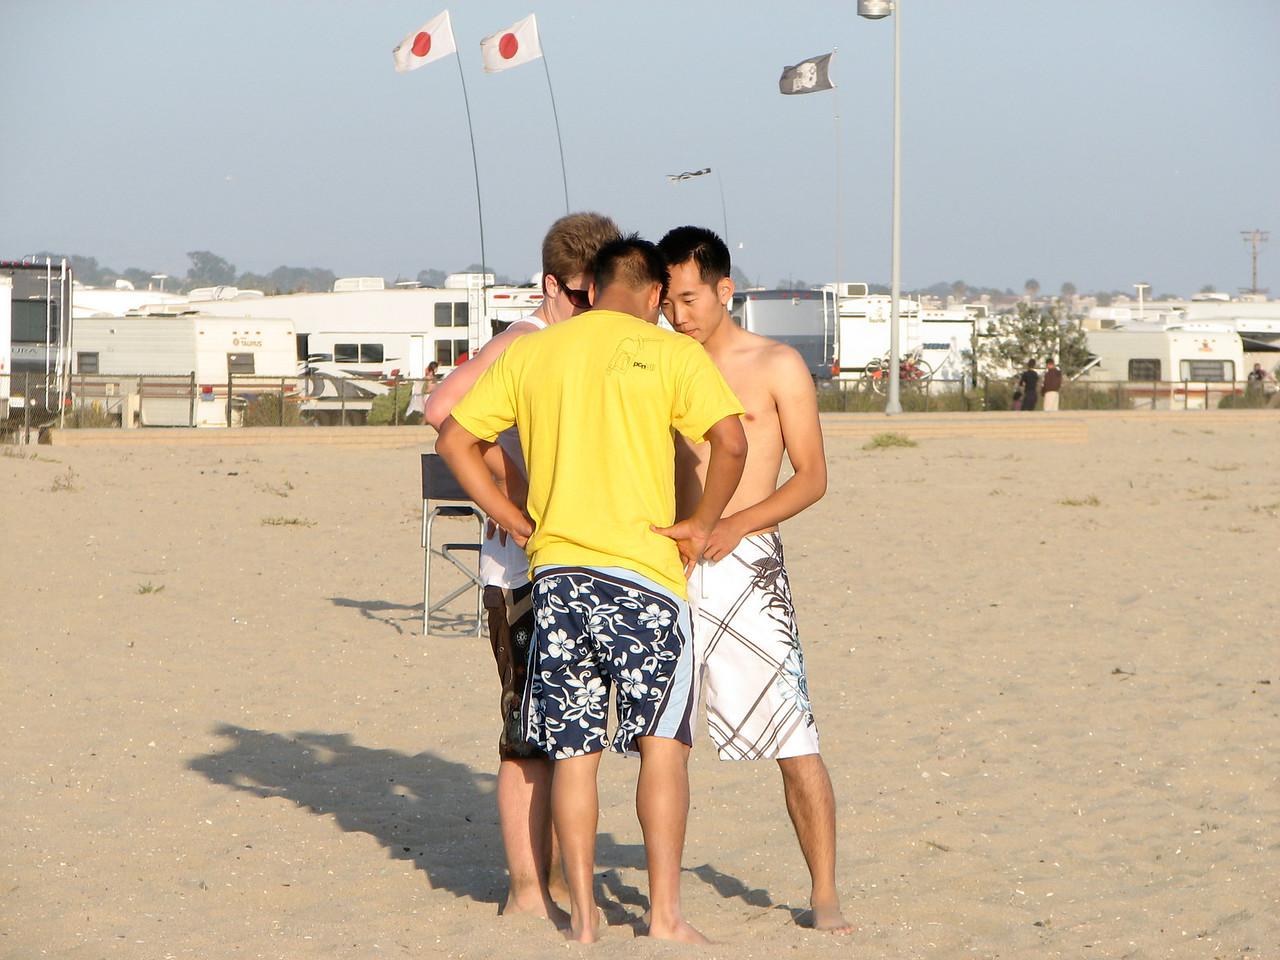 2007 06 22 Fri - Scott, David, & Daniel Chung huddle